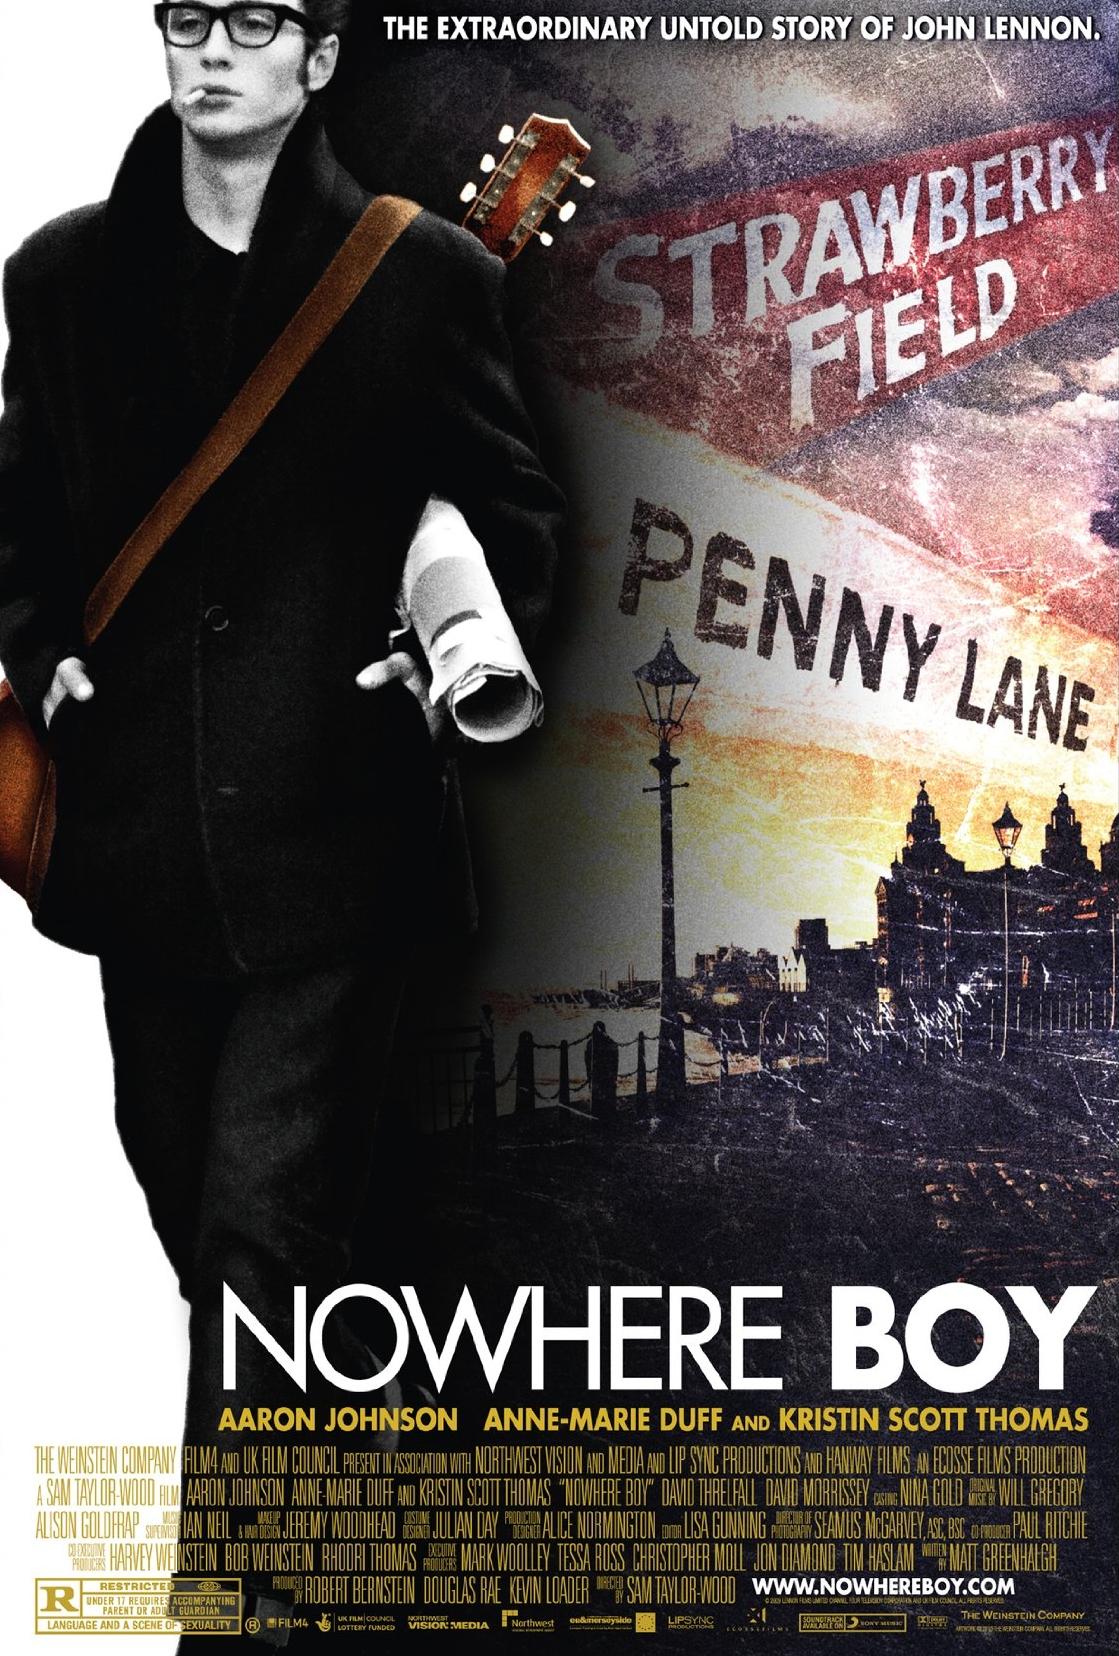 NOWHERE BOY – JOHN LENNON: INCEPUTUL UNEI LEGENDE (2009)